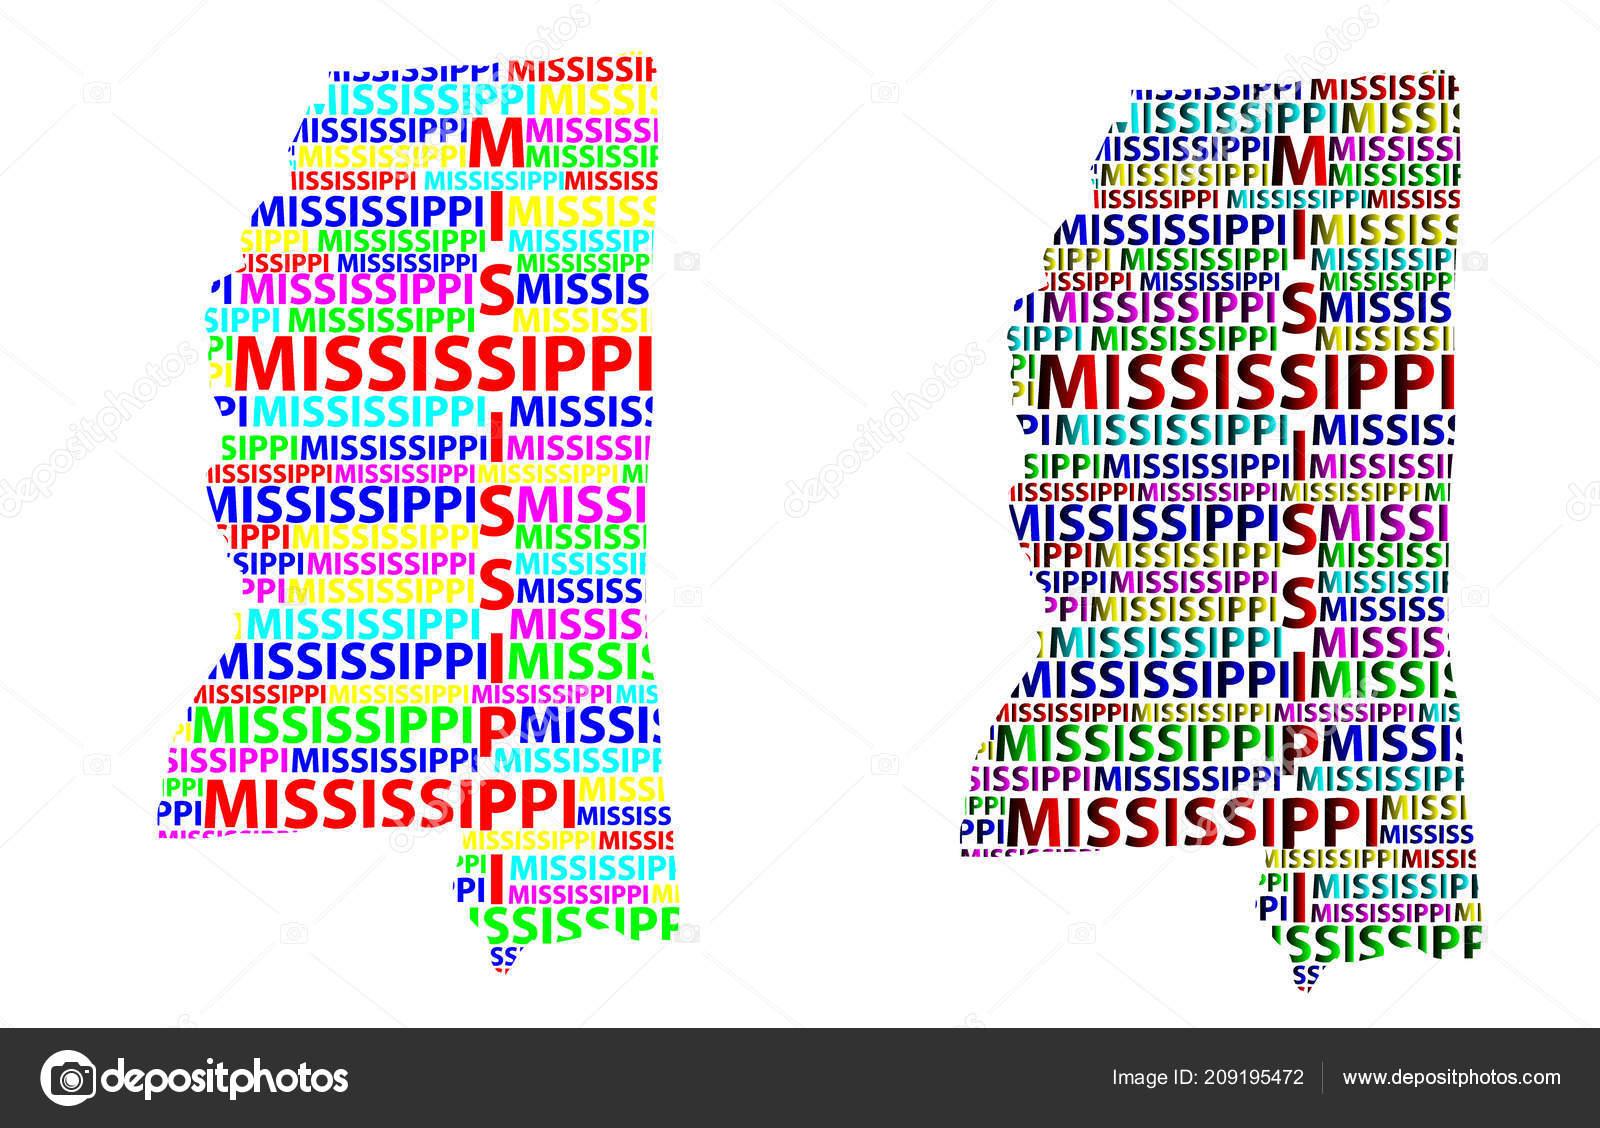 United States Map Mississippi.Sketch Mississippi United States America Letter Text Map Mississippi